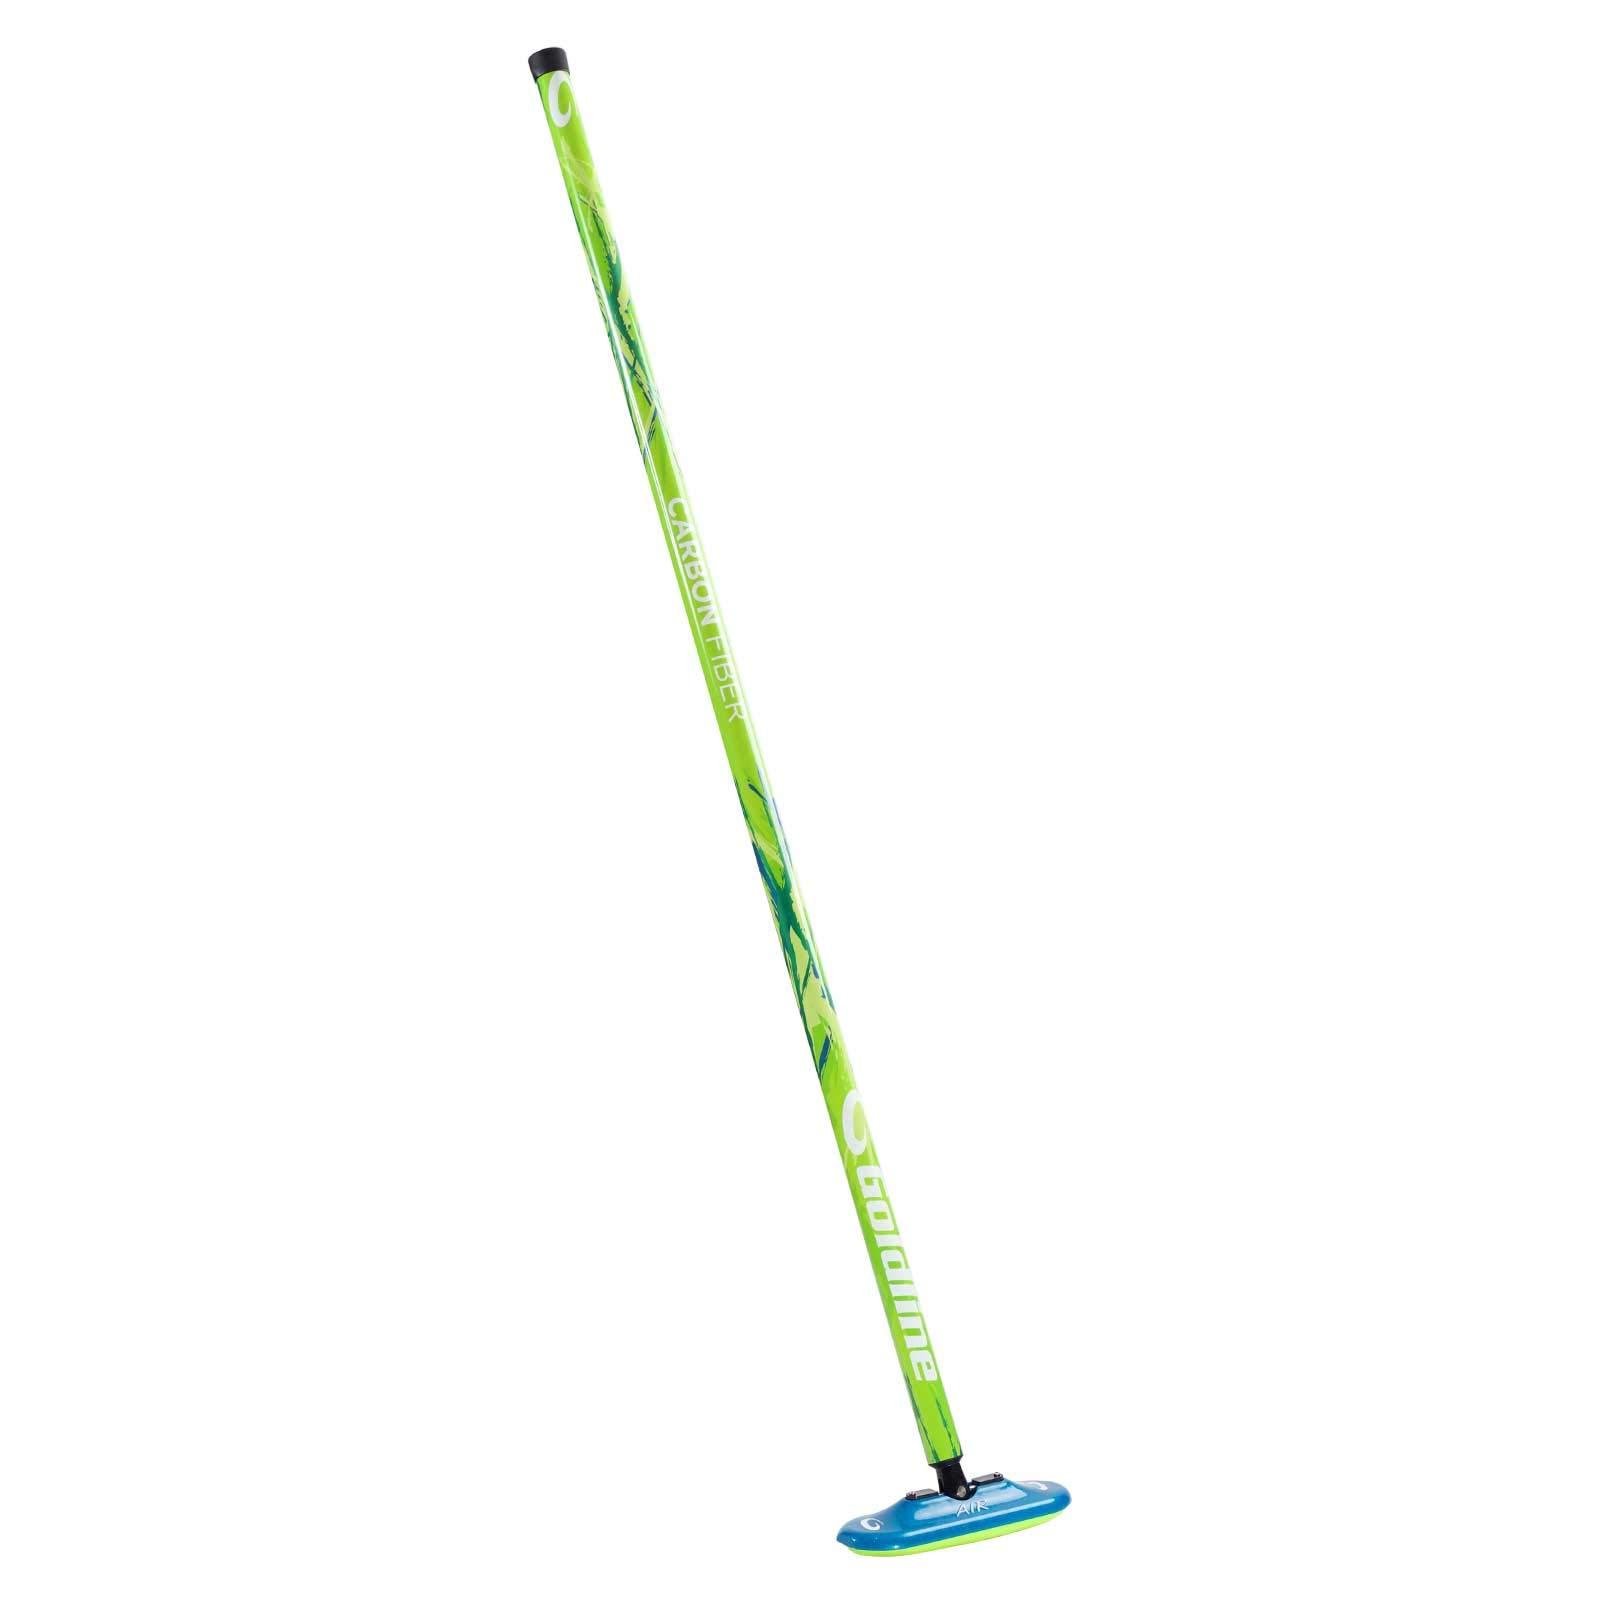 Carbon Fiber Air Curling Broom: Earth 1 1/8'' by Goldline Curling